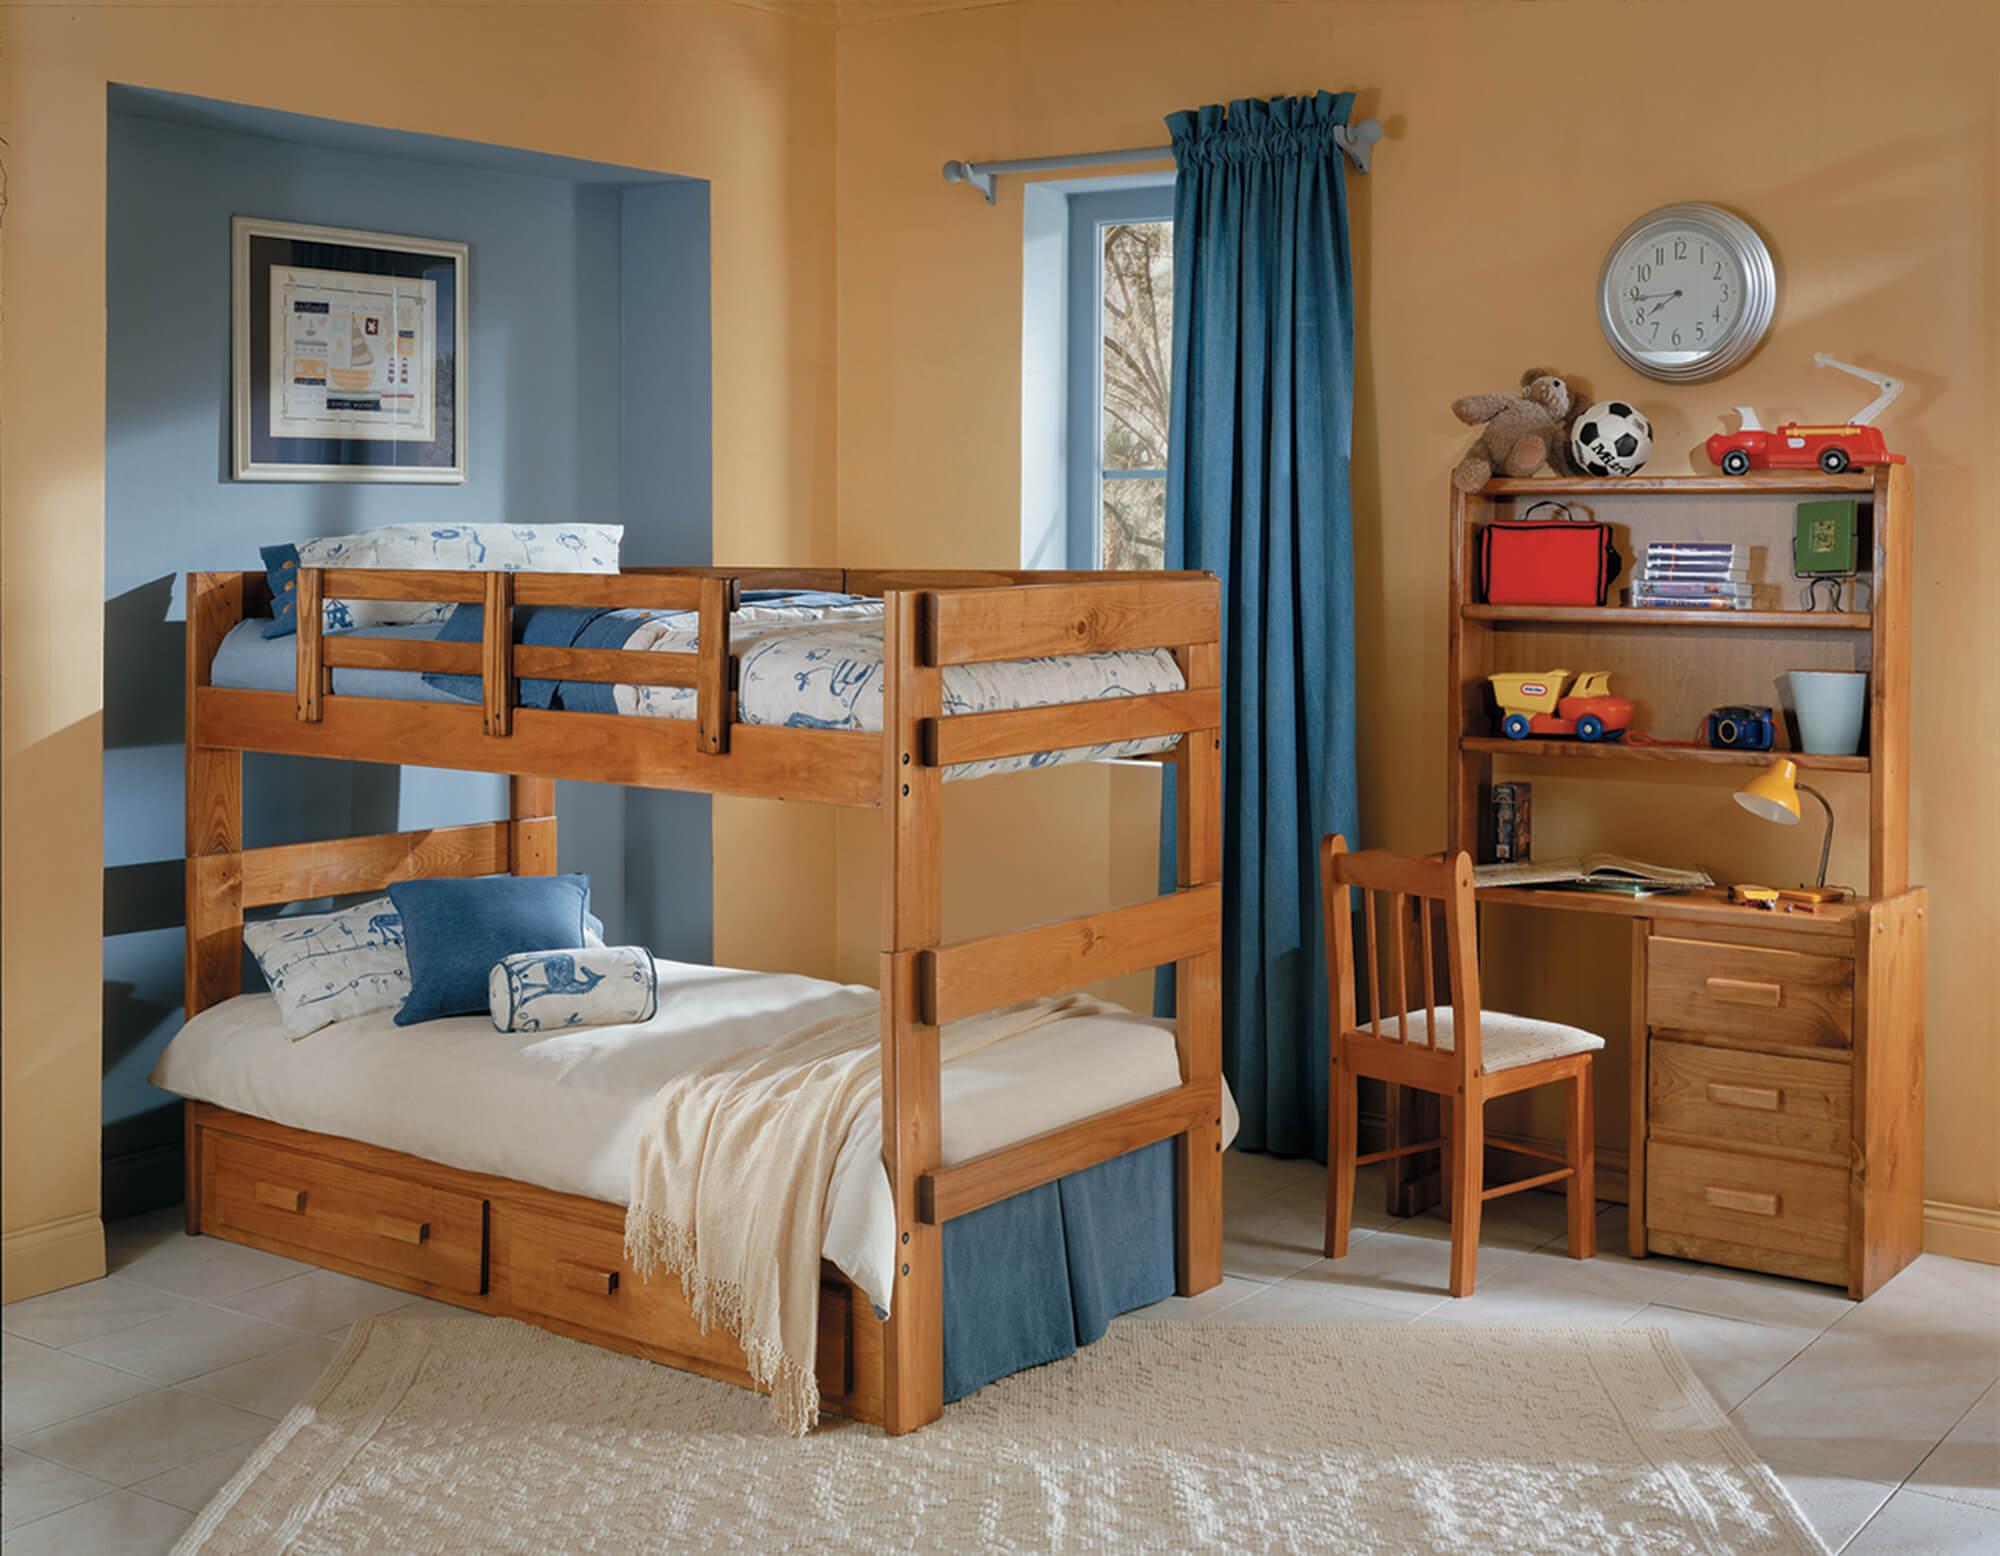 Woodcrest Solid Pine Bunk Bed Kids Bunk Beds